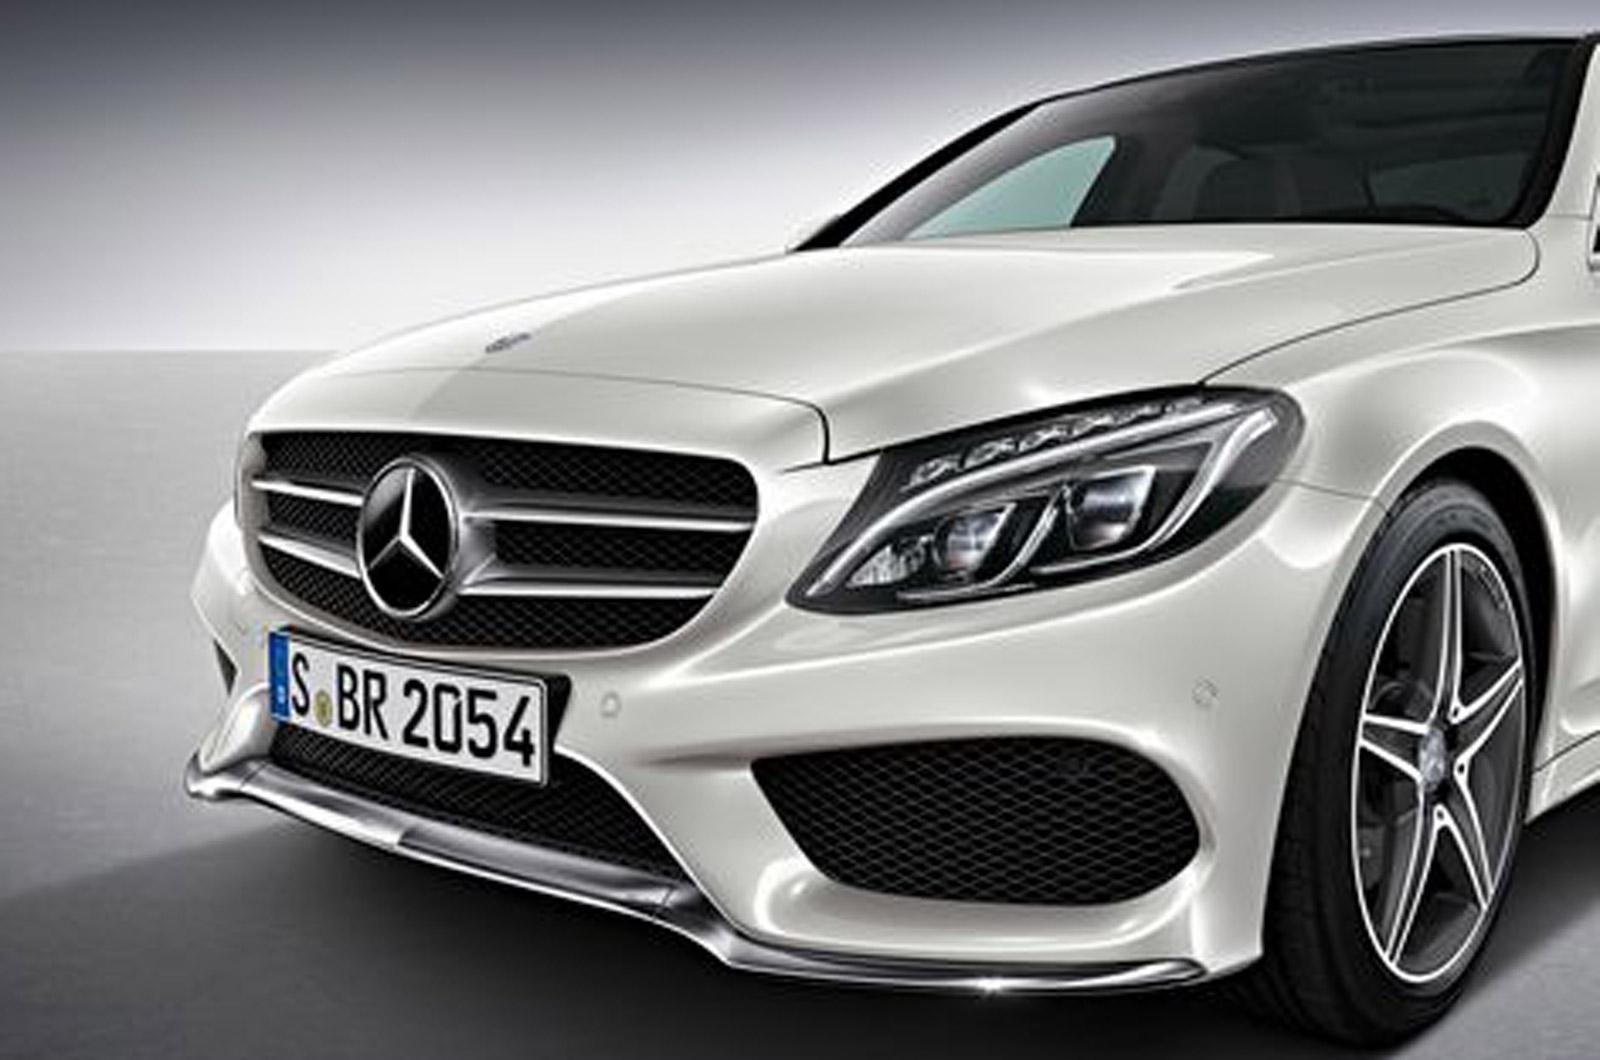 2014 mercedes benz c class image 9 for Mercedes benz clase c